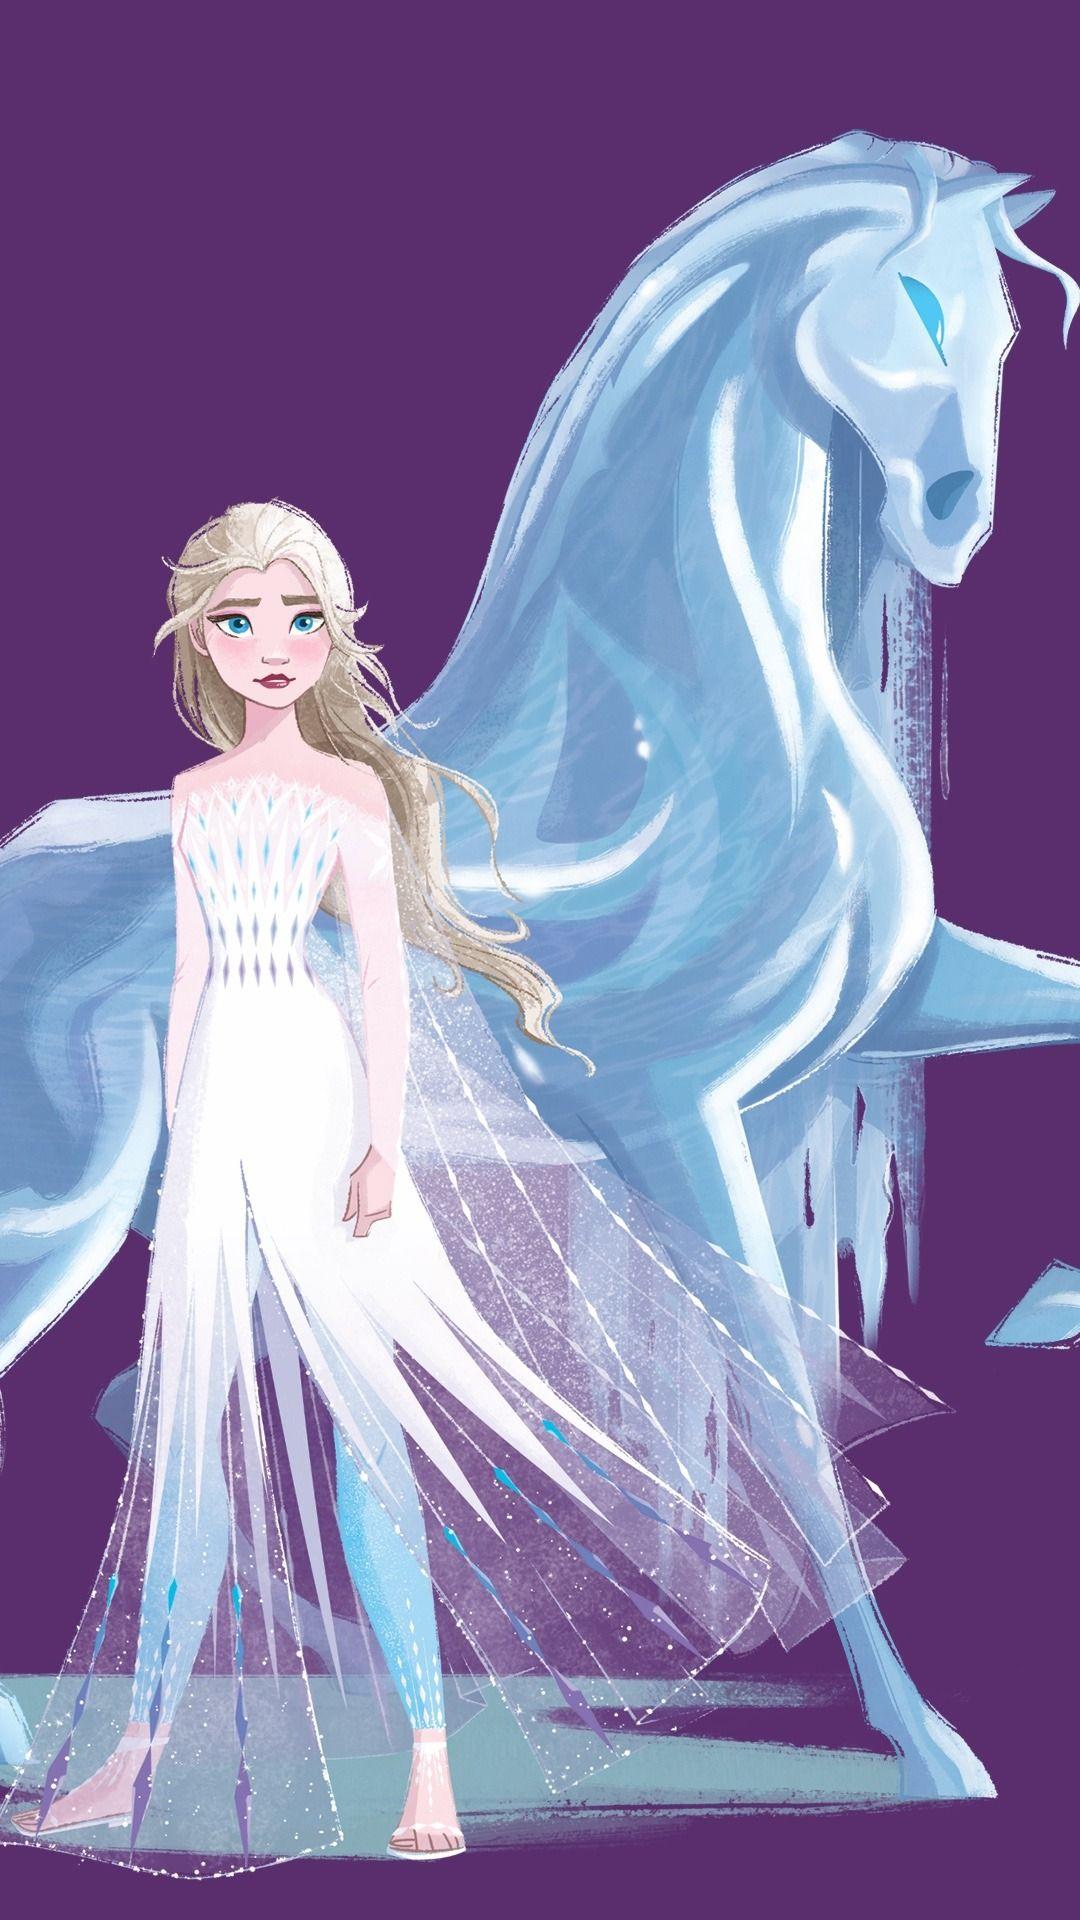 Rivera Frozen 2 Lockscreens Like Or Reblog In 2020 Disney Princess Pictures Frozen Art Disney Princess Fashion